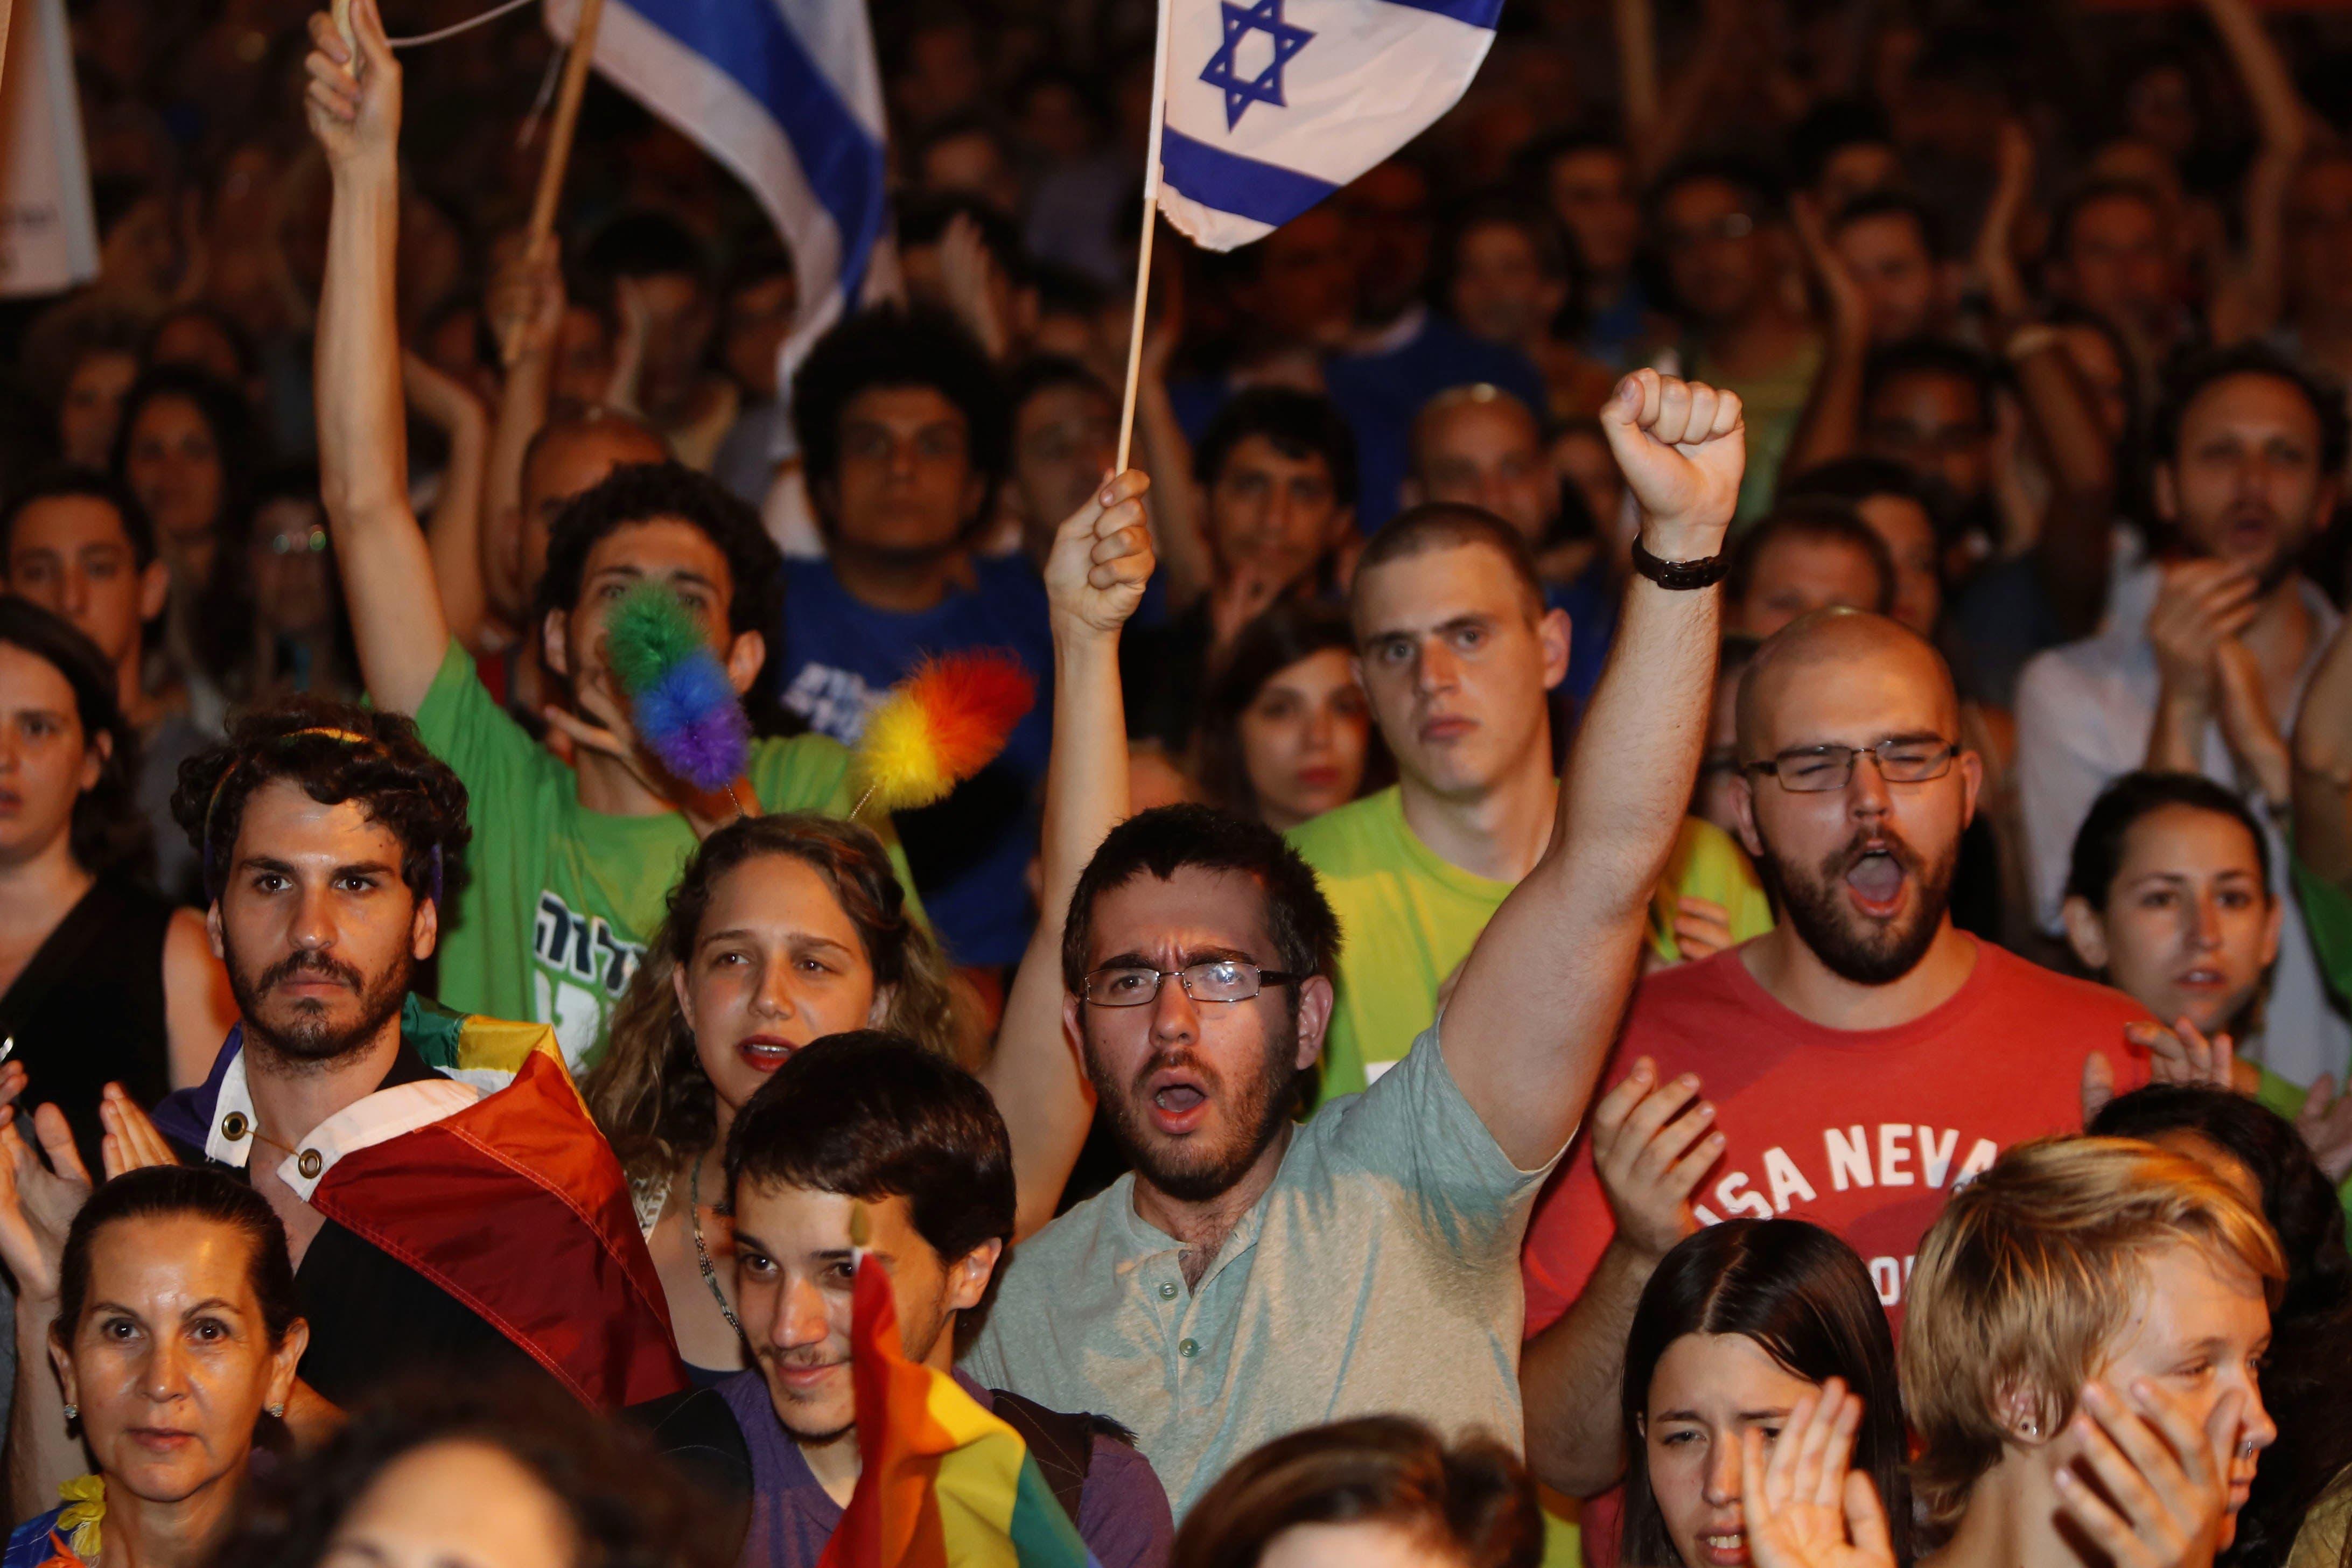 Against essay false gathered jerusalem peace